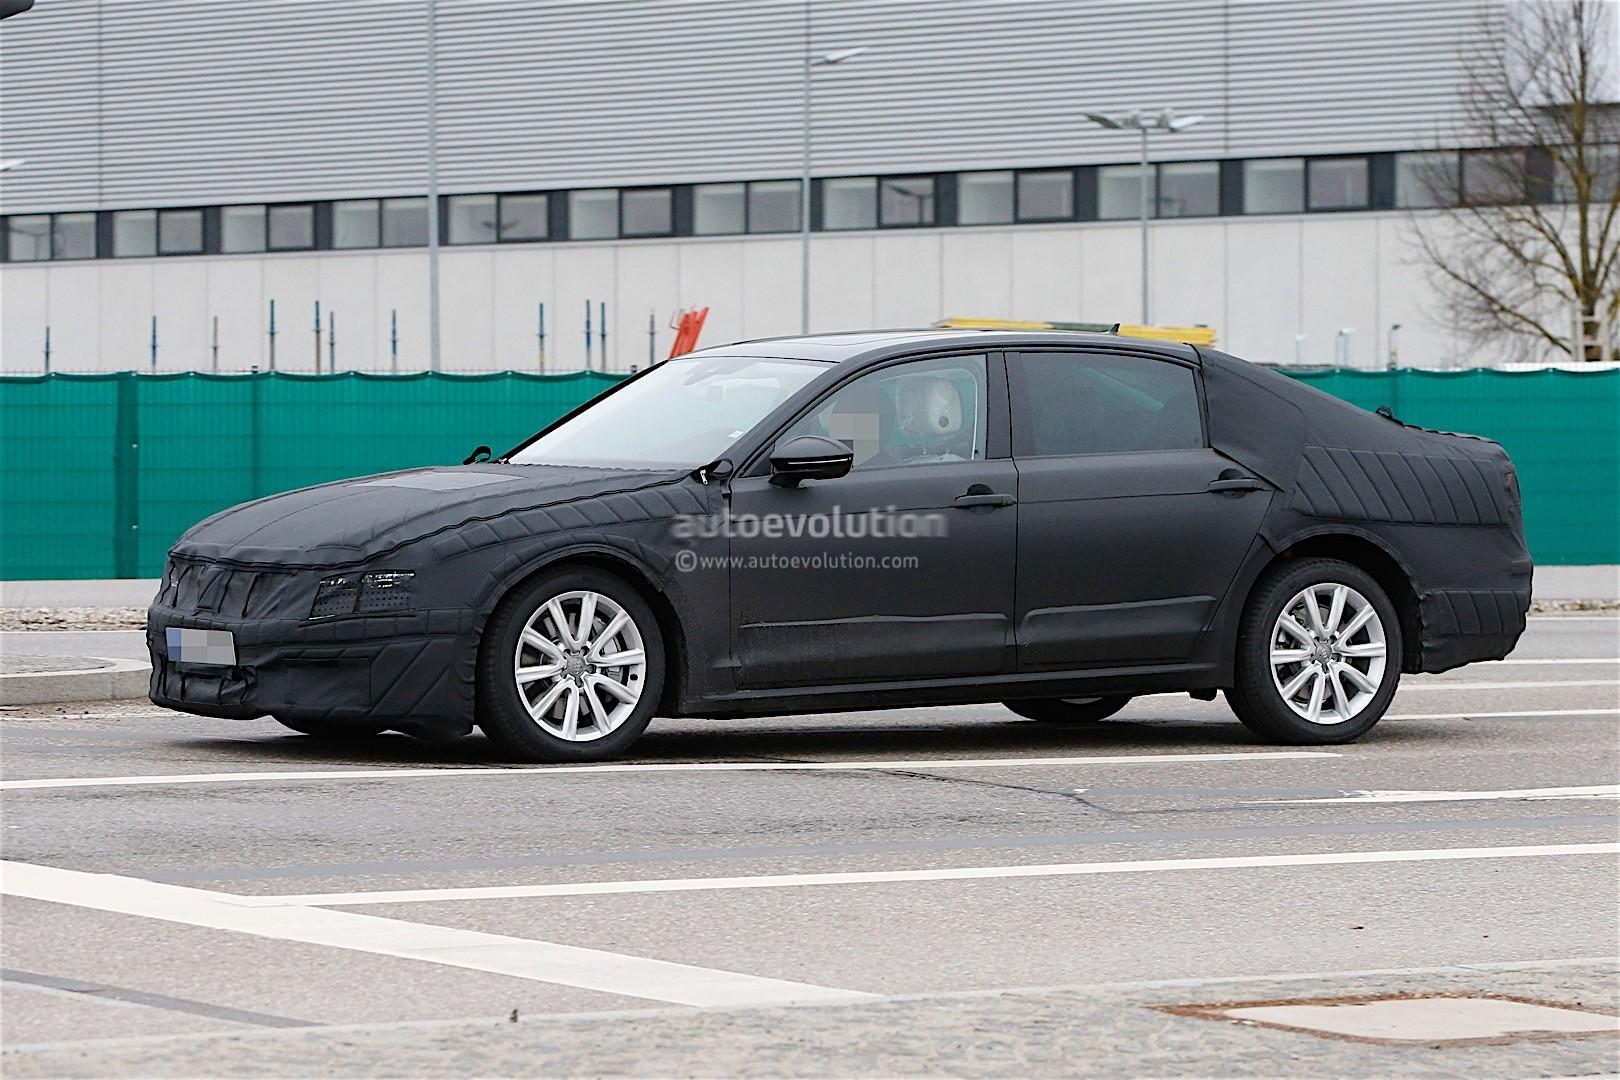 Volkswagen's Long-Wheelbase Plug-In Hybrid Magotan Spied ...